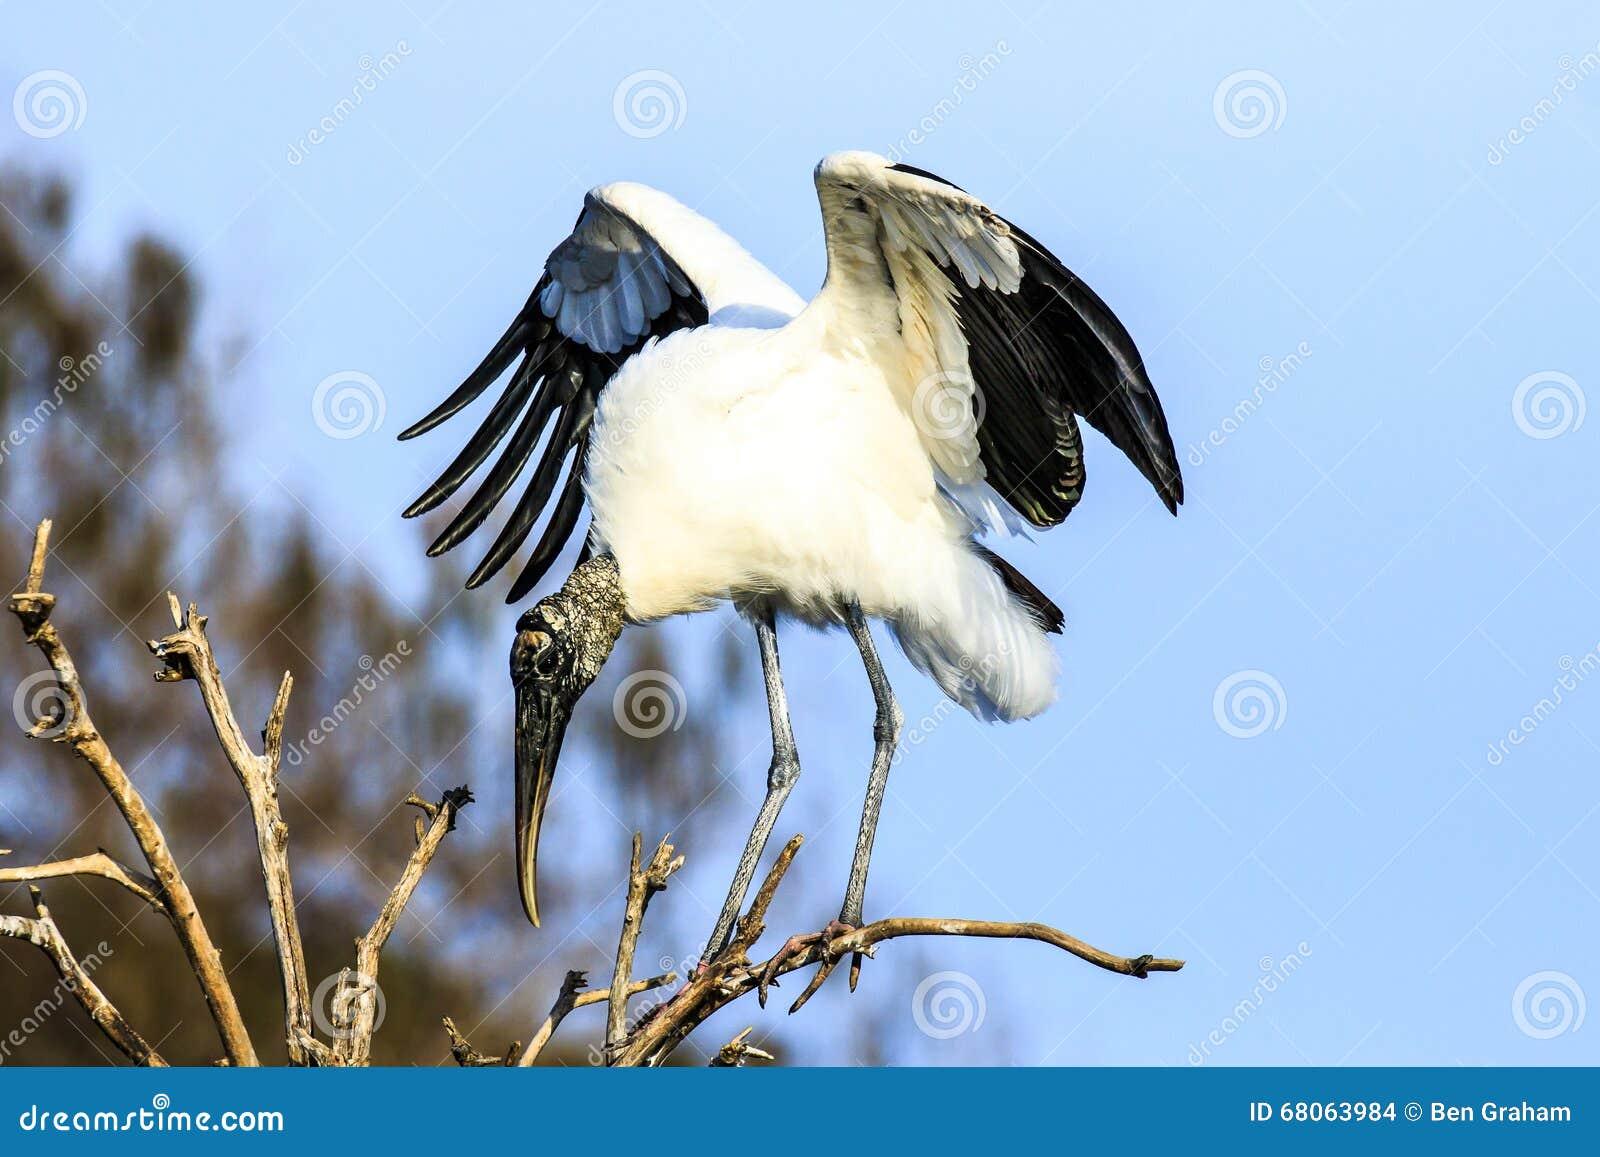 Tropical Island Beach Ambience Sound: Wood Stork Stock Photo. Image Of Florida, Wakodahatchee